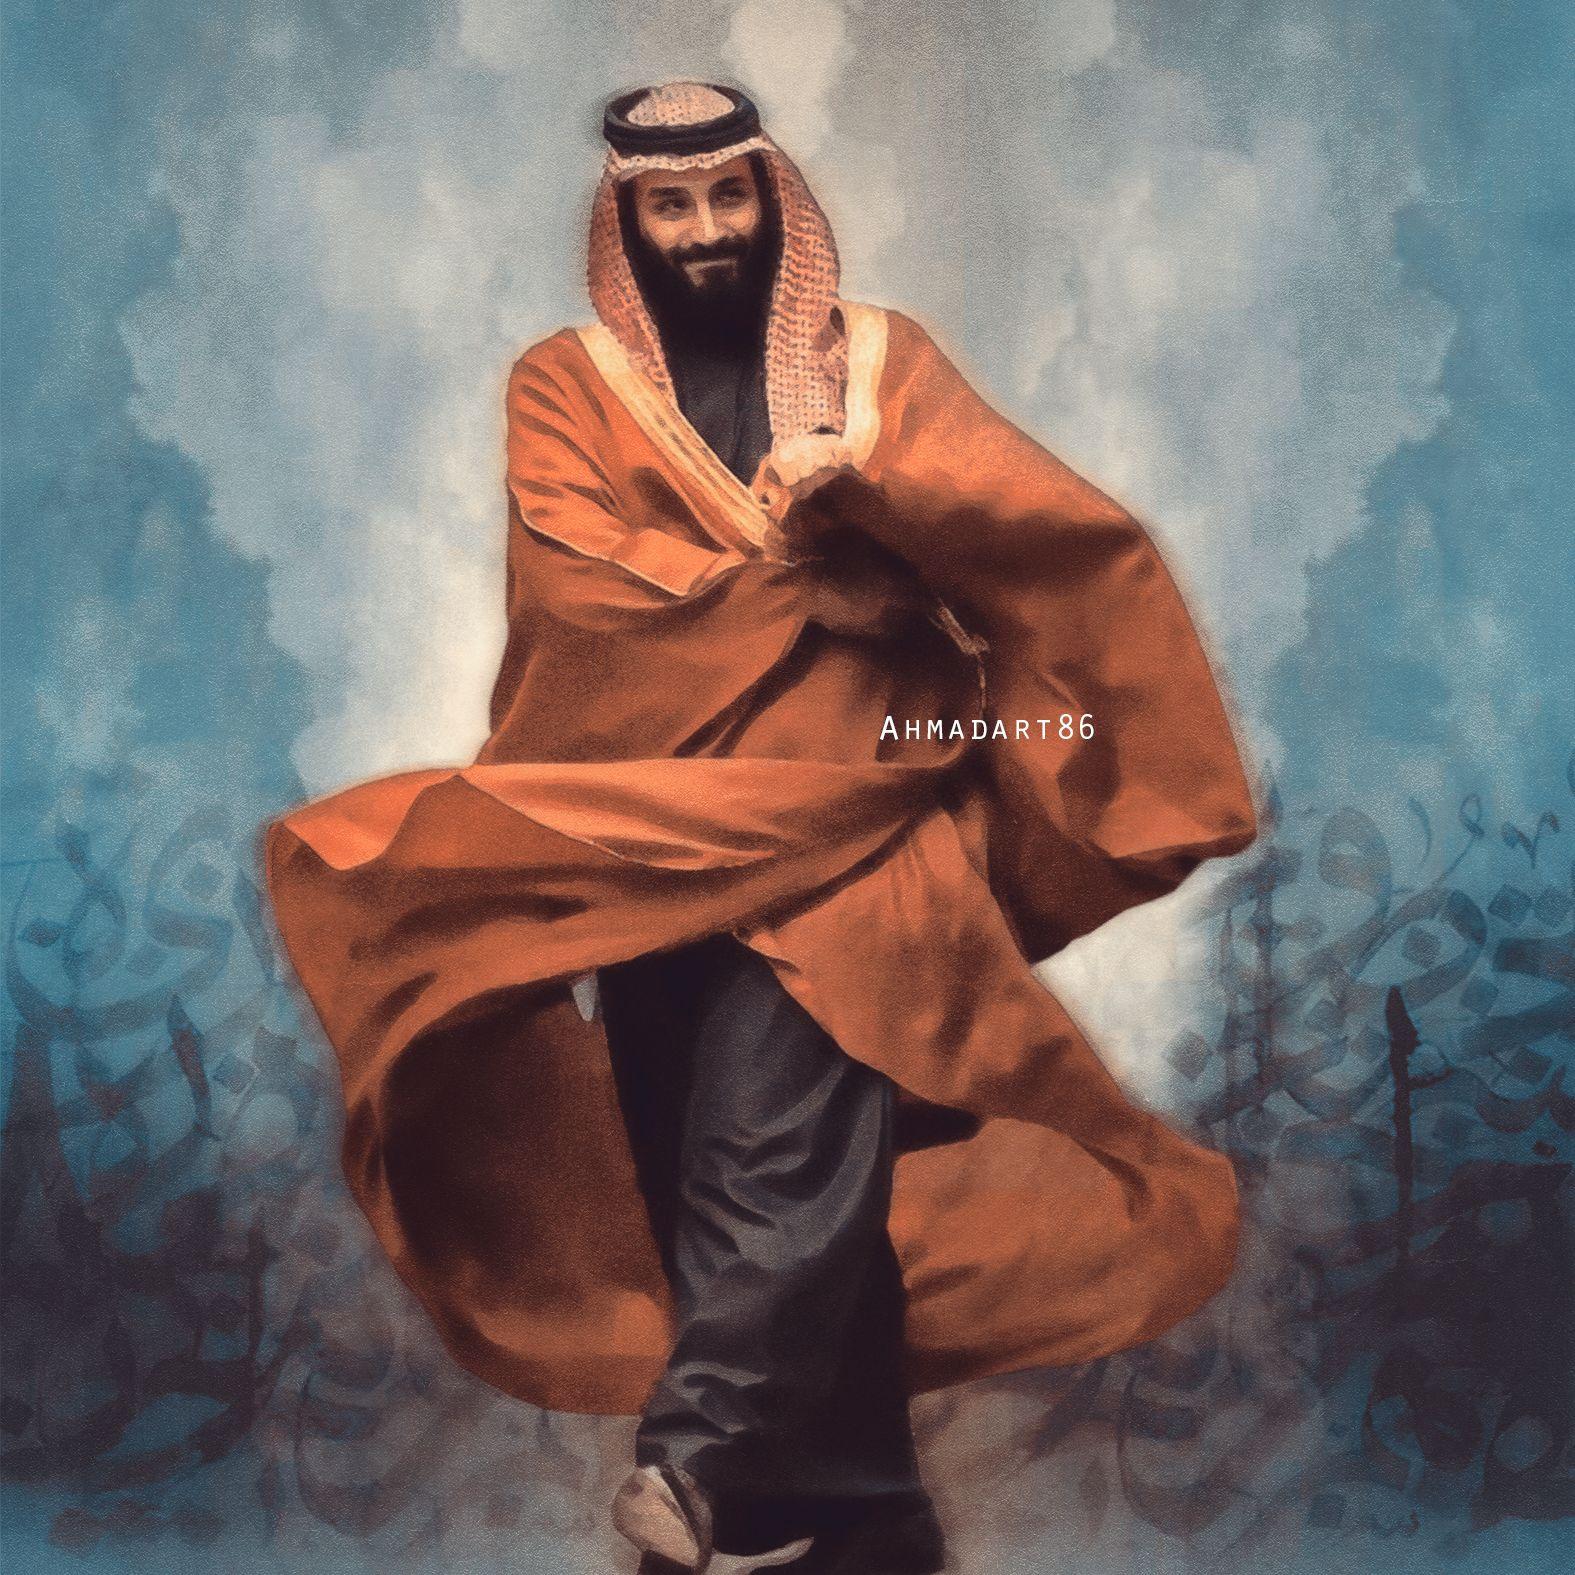 محمد بن سلمان Arabian Art Islamic Art Arabic Art